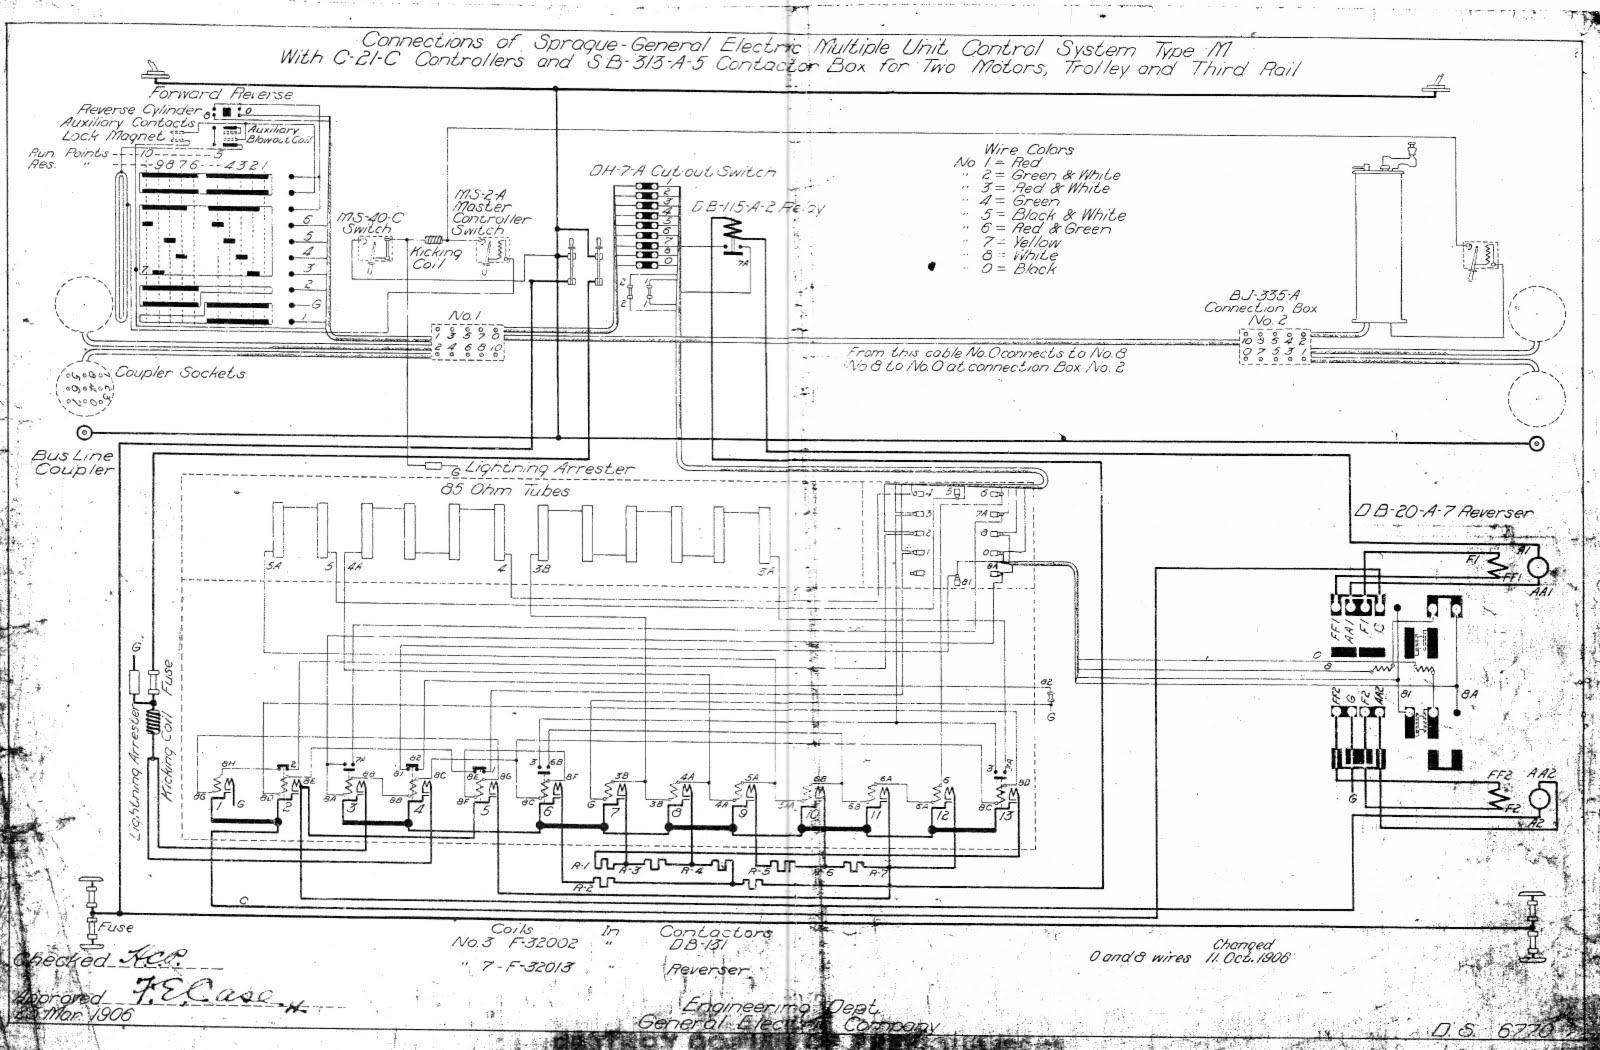 medium resolution of 1984 dodge 318 ignition wiring diagram wiring library diagram on dodge durango engine diagram likewise ram 1500 wiring